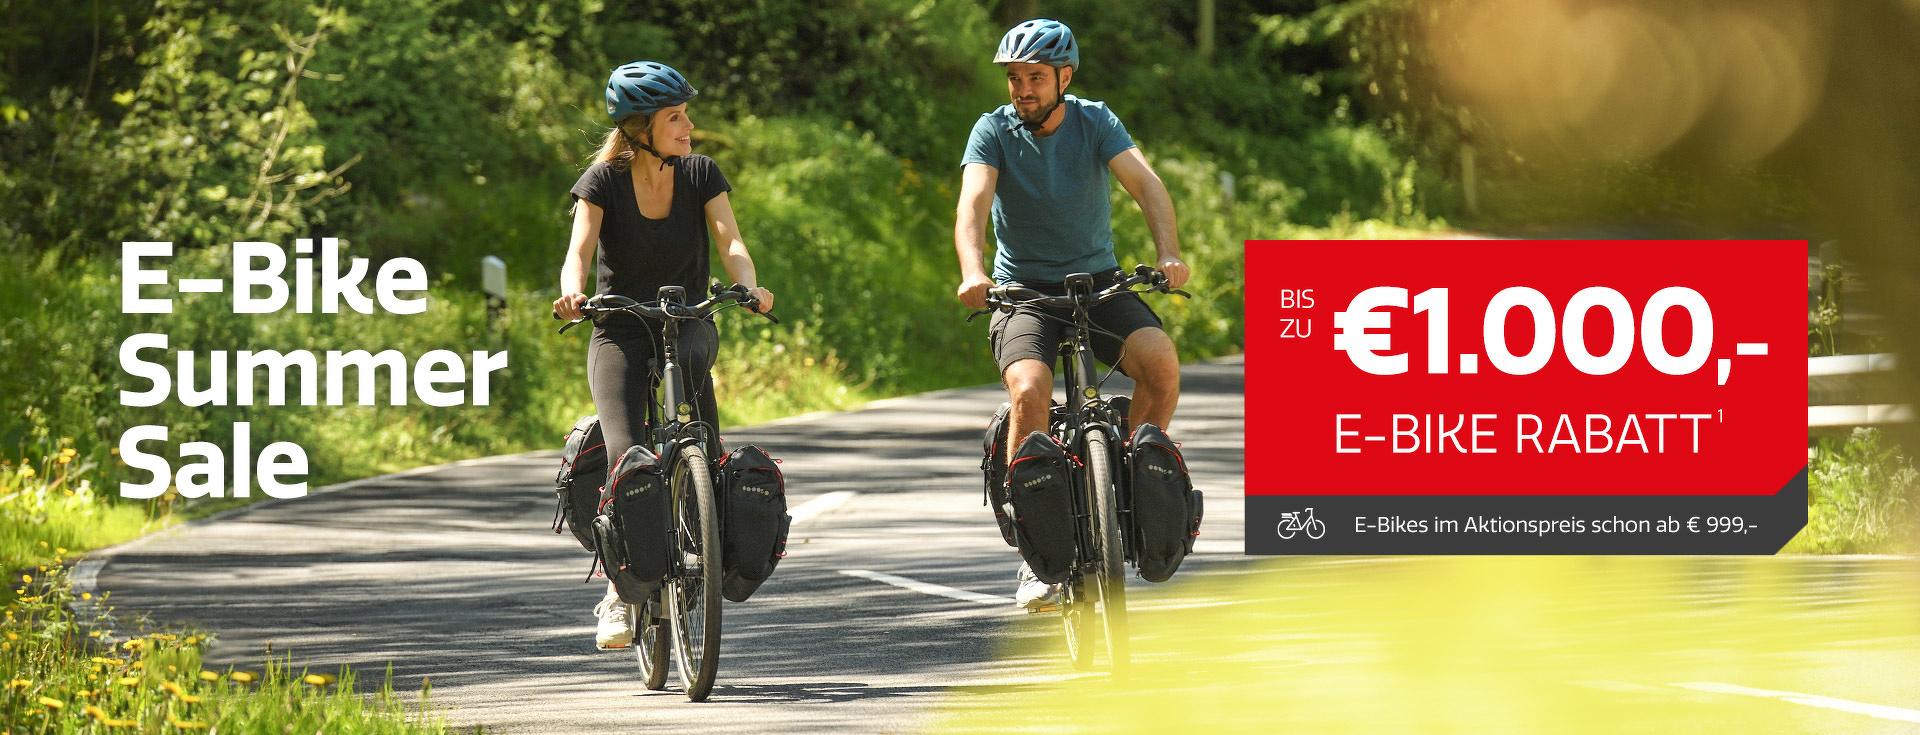 E-Bike Summer Sale